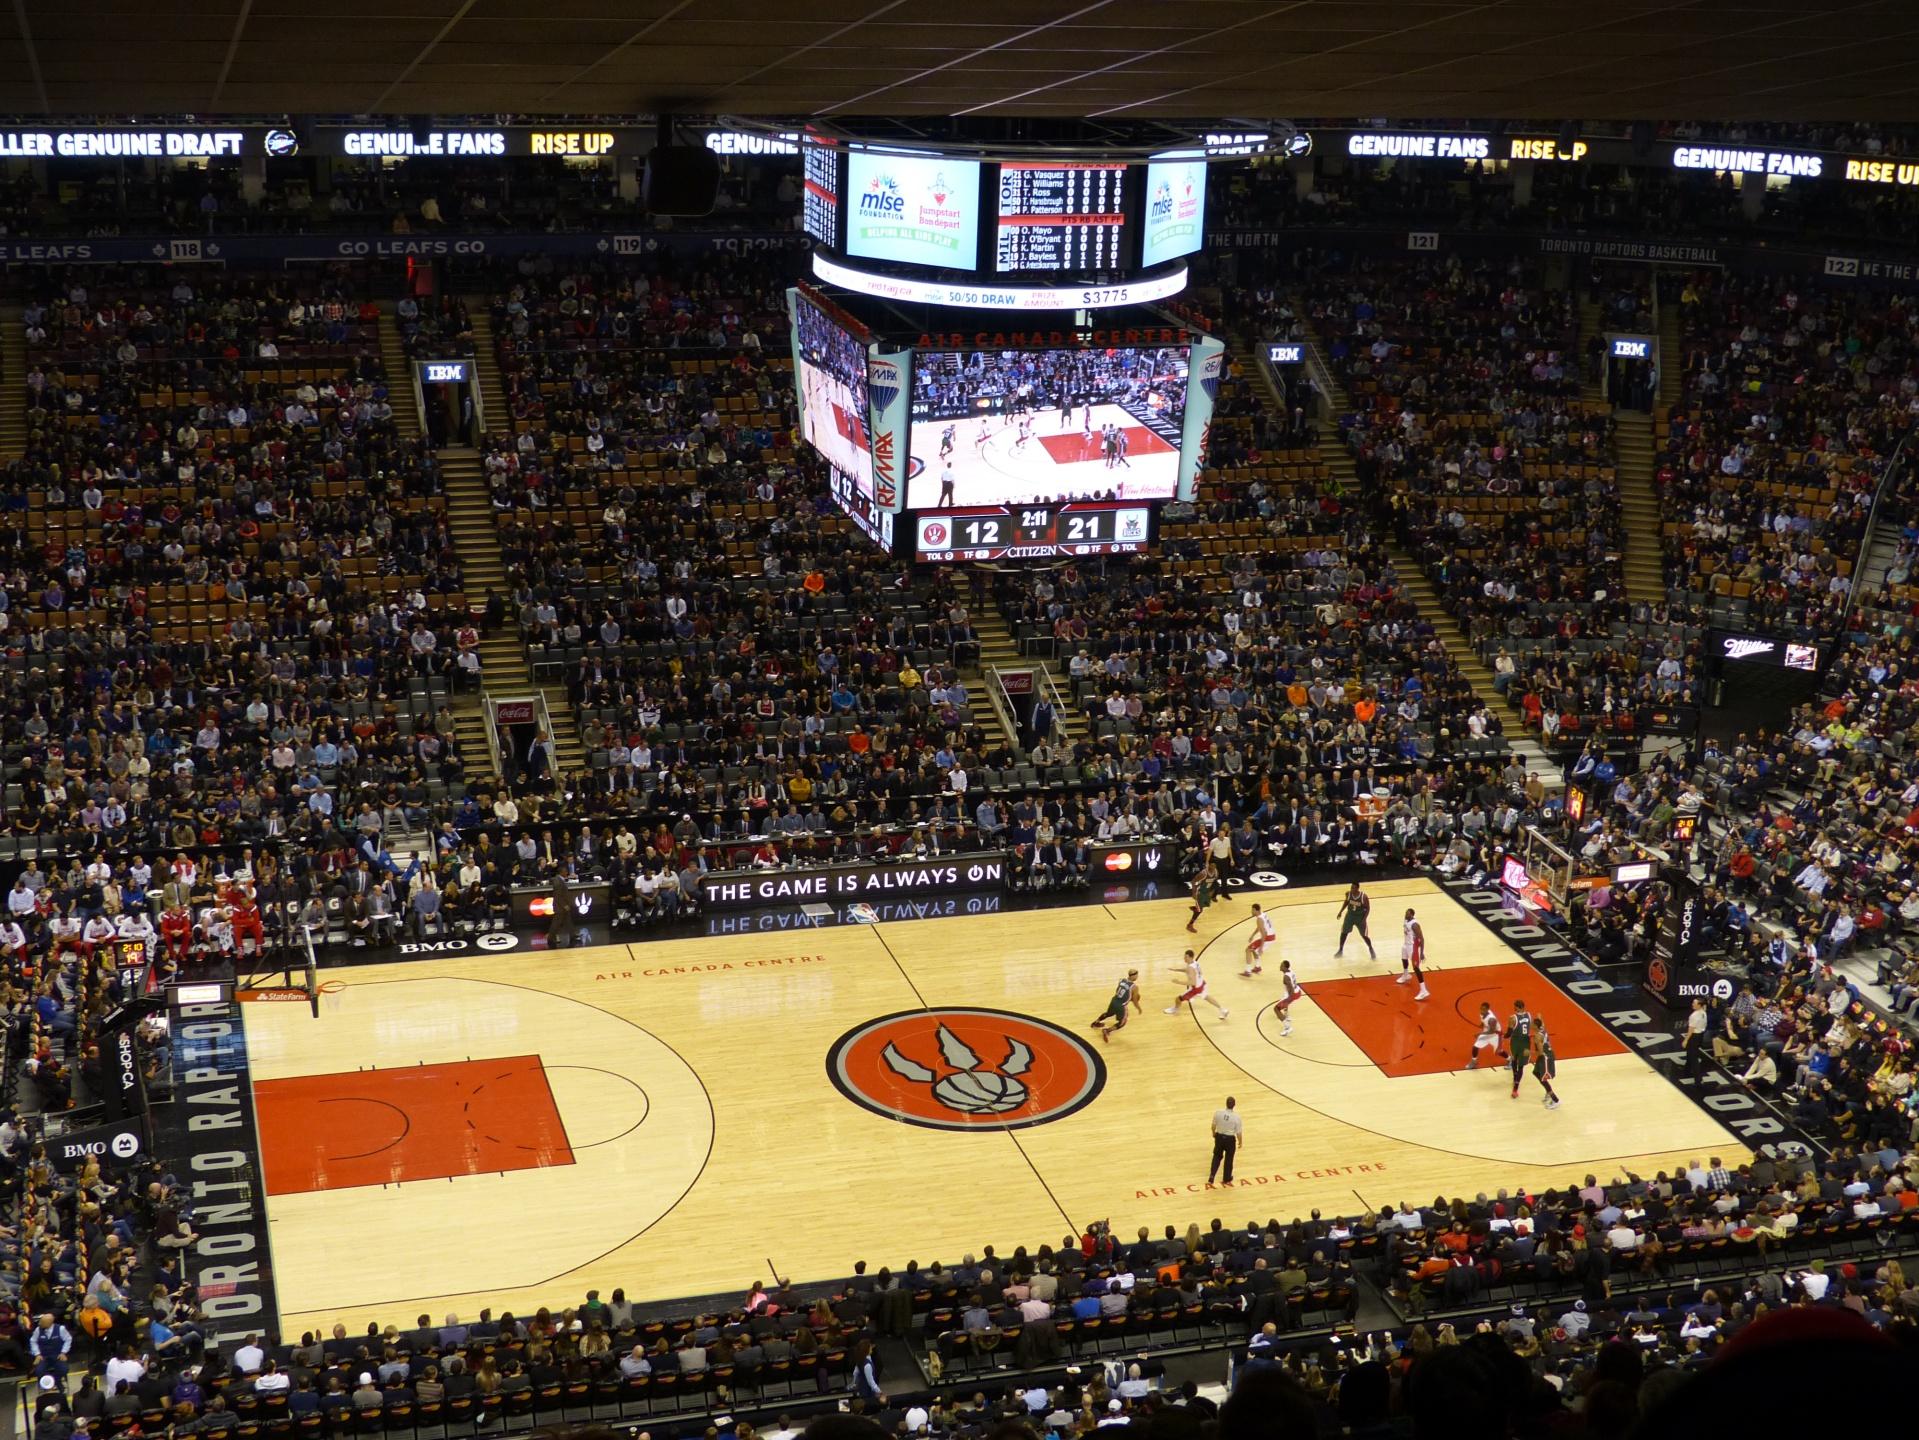 Toronto Raptors Air Canada Centre